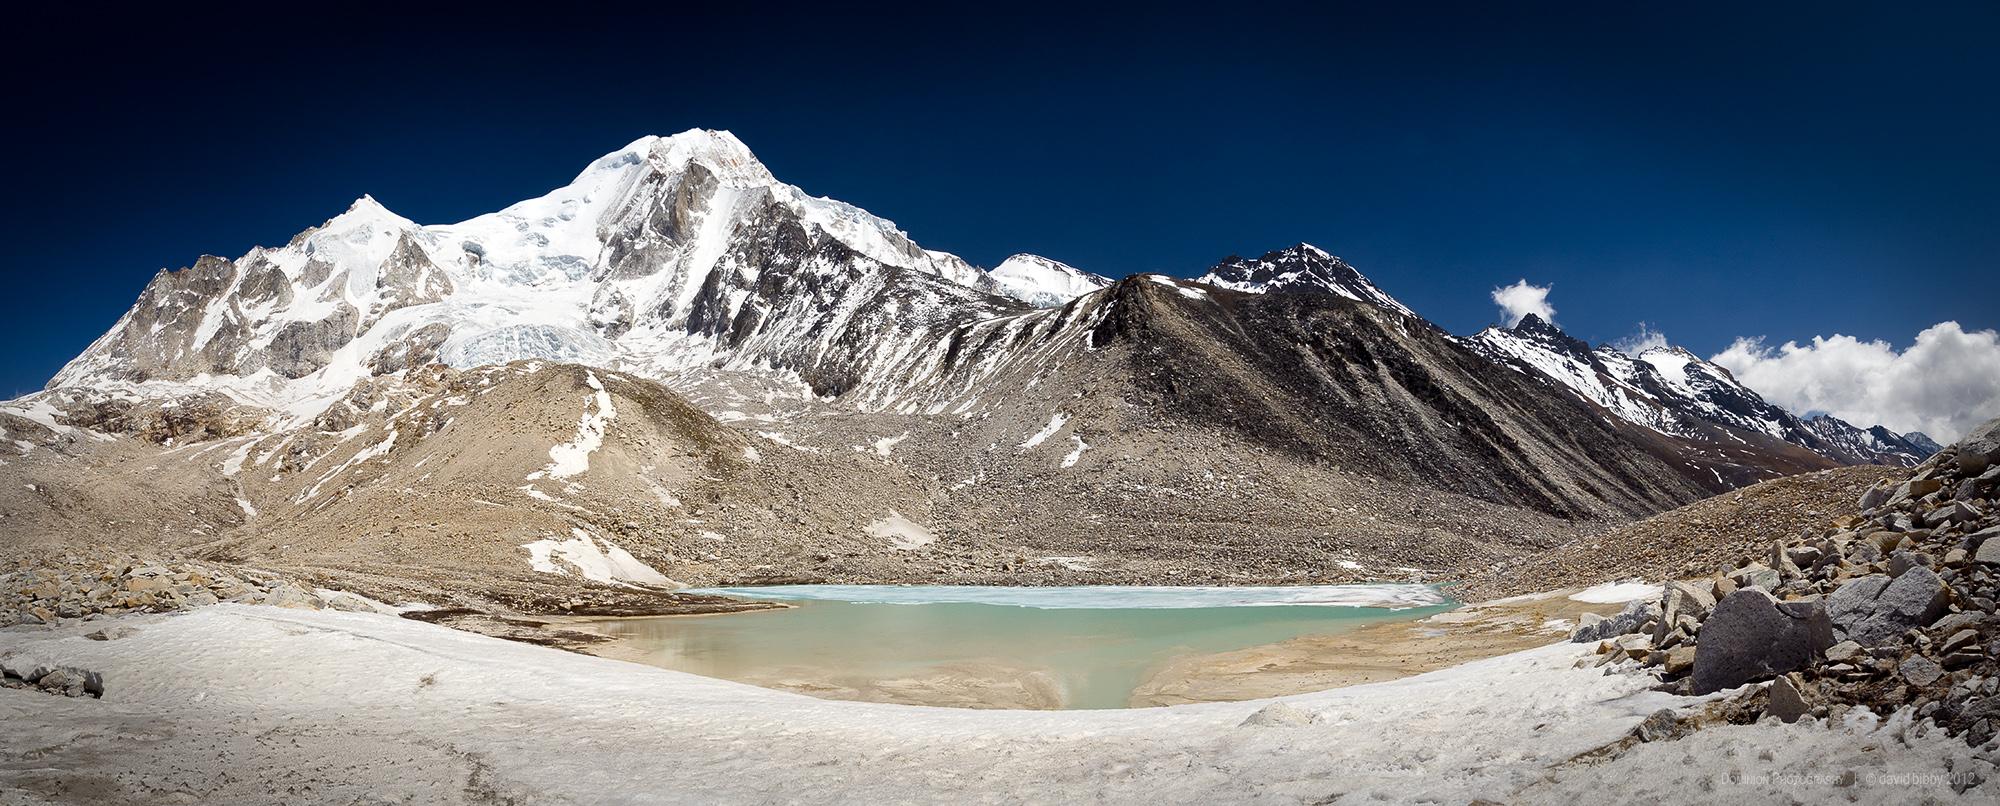 The Pawar Himal (6621m) from just below the Larkya La (5160m). Manaslu Conservation Area.